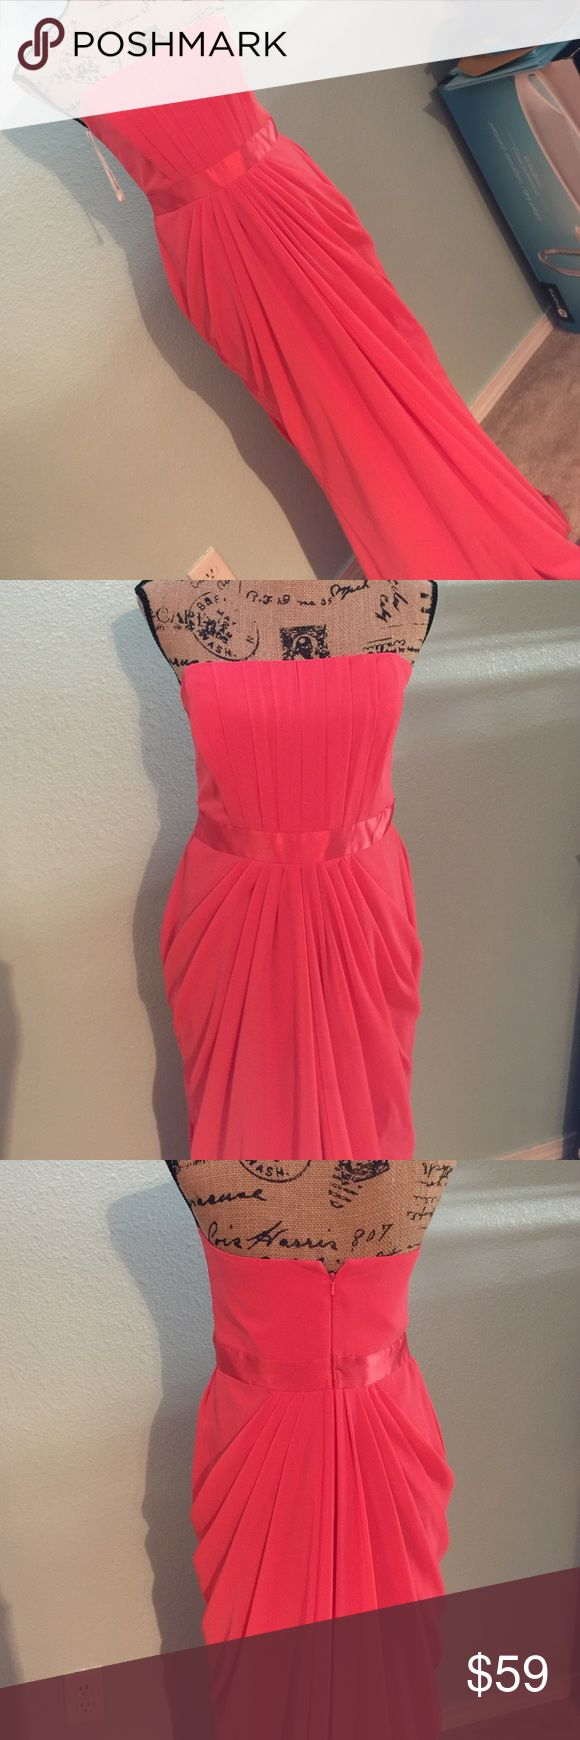 ✨⚡️FLASH SALE!!! Coral David's Bridal Dress Perfect condition bridesmaid dress. Lined. Chiffon. David's Bridal Dresses Prom